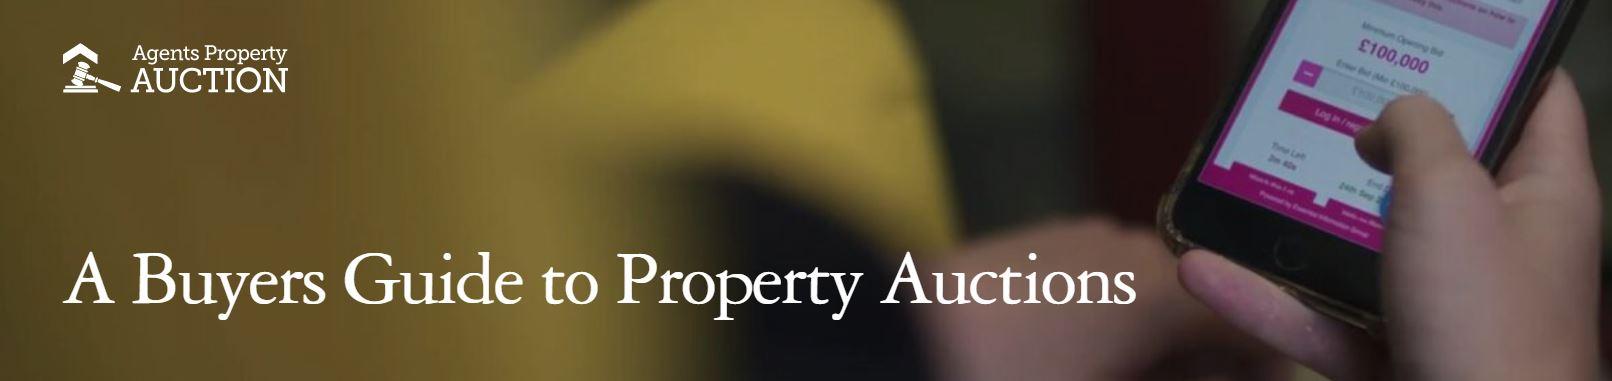 auctionbuyers